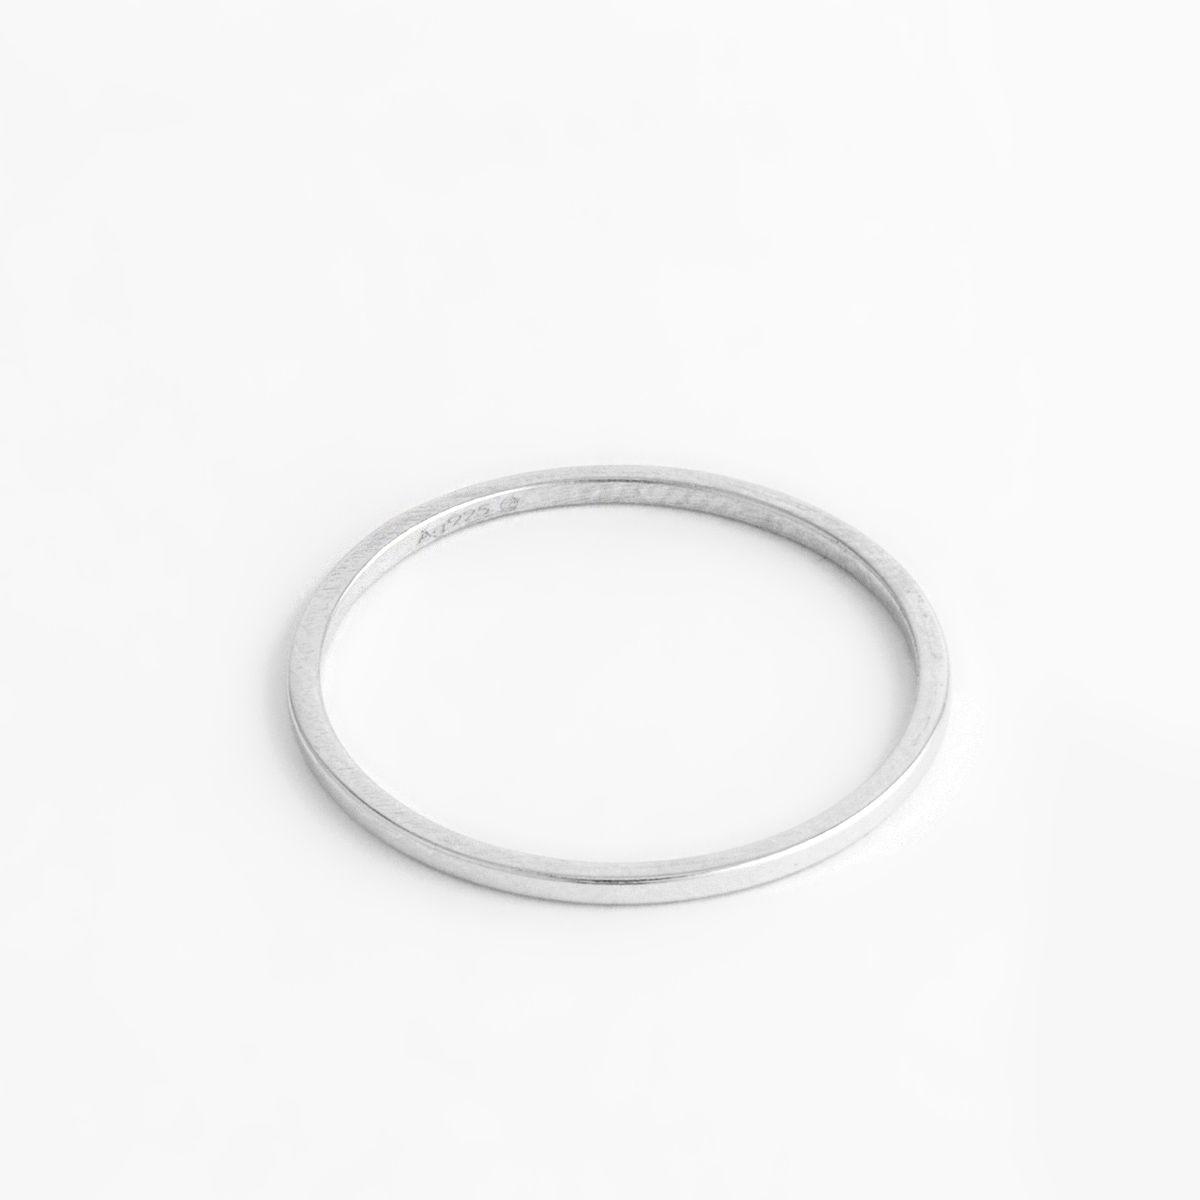 Carina - Ringe - Silber